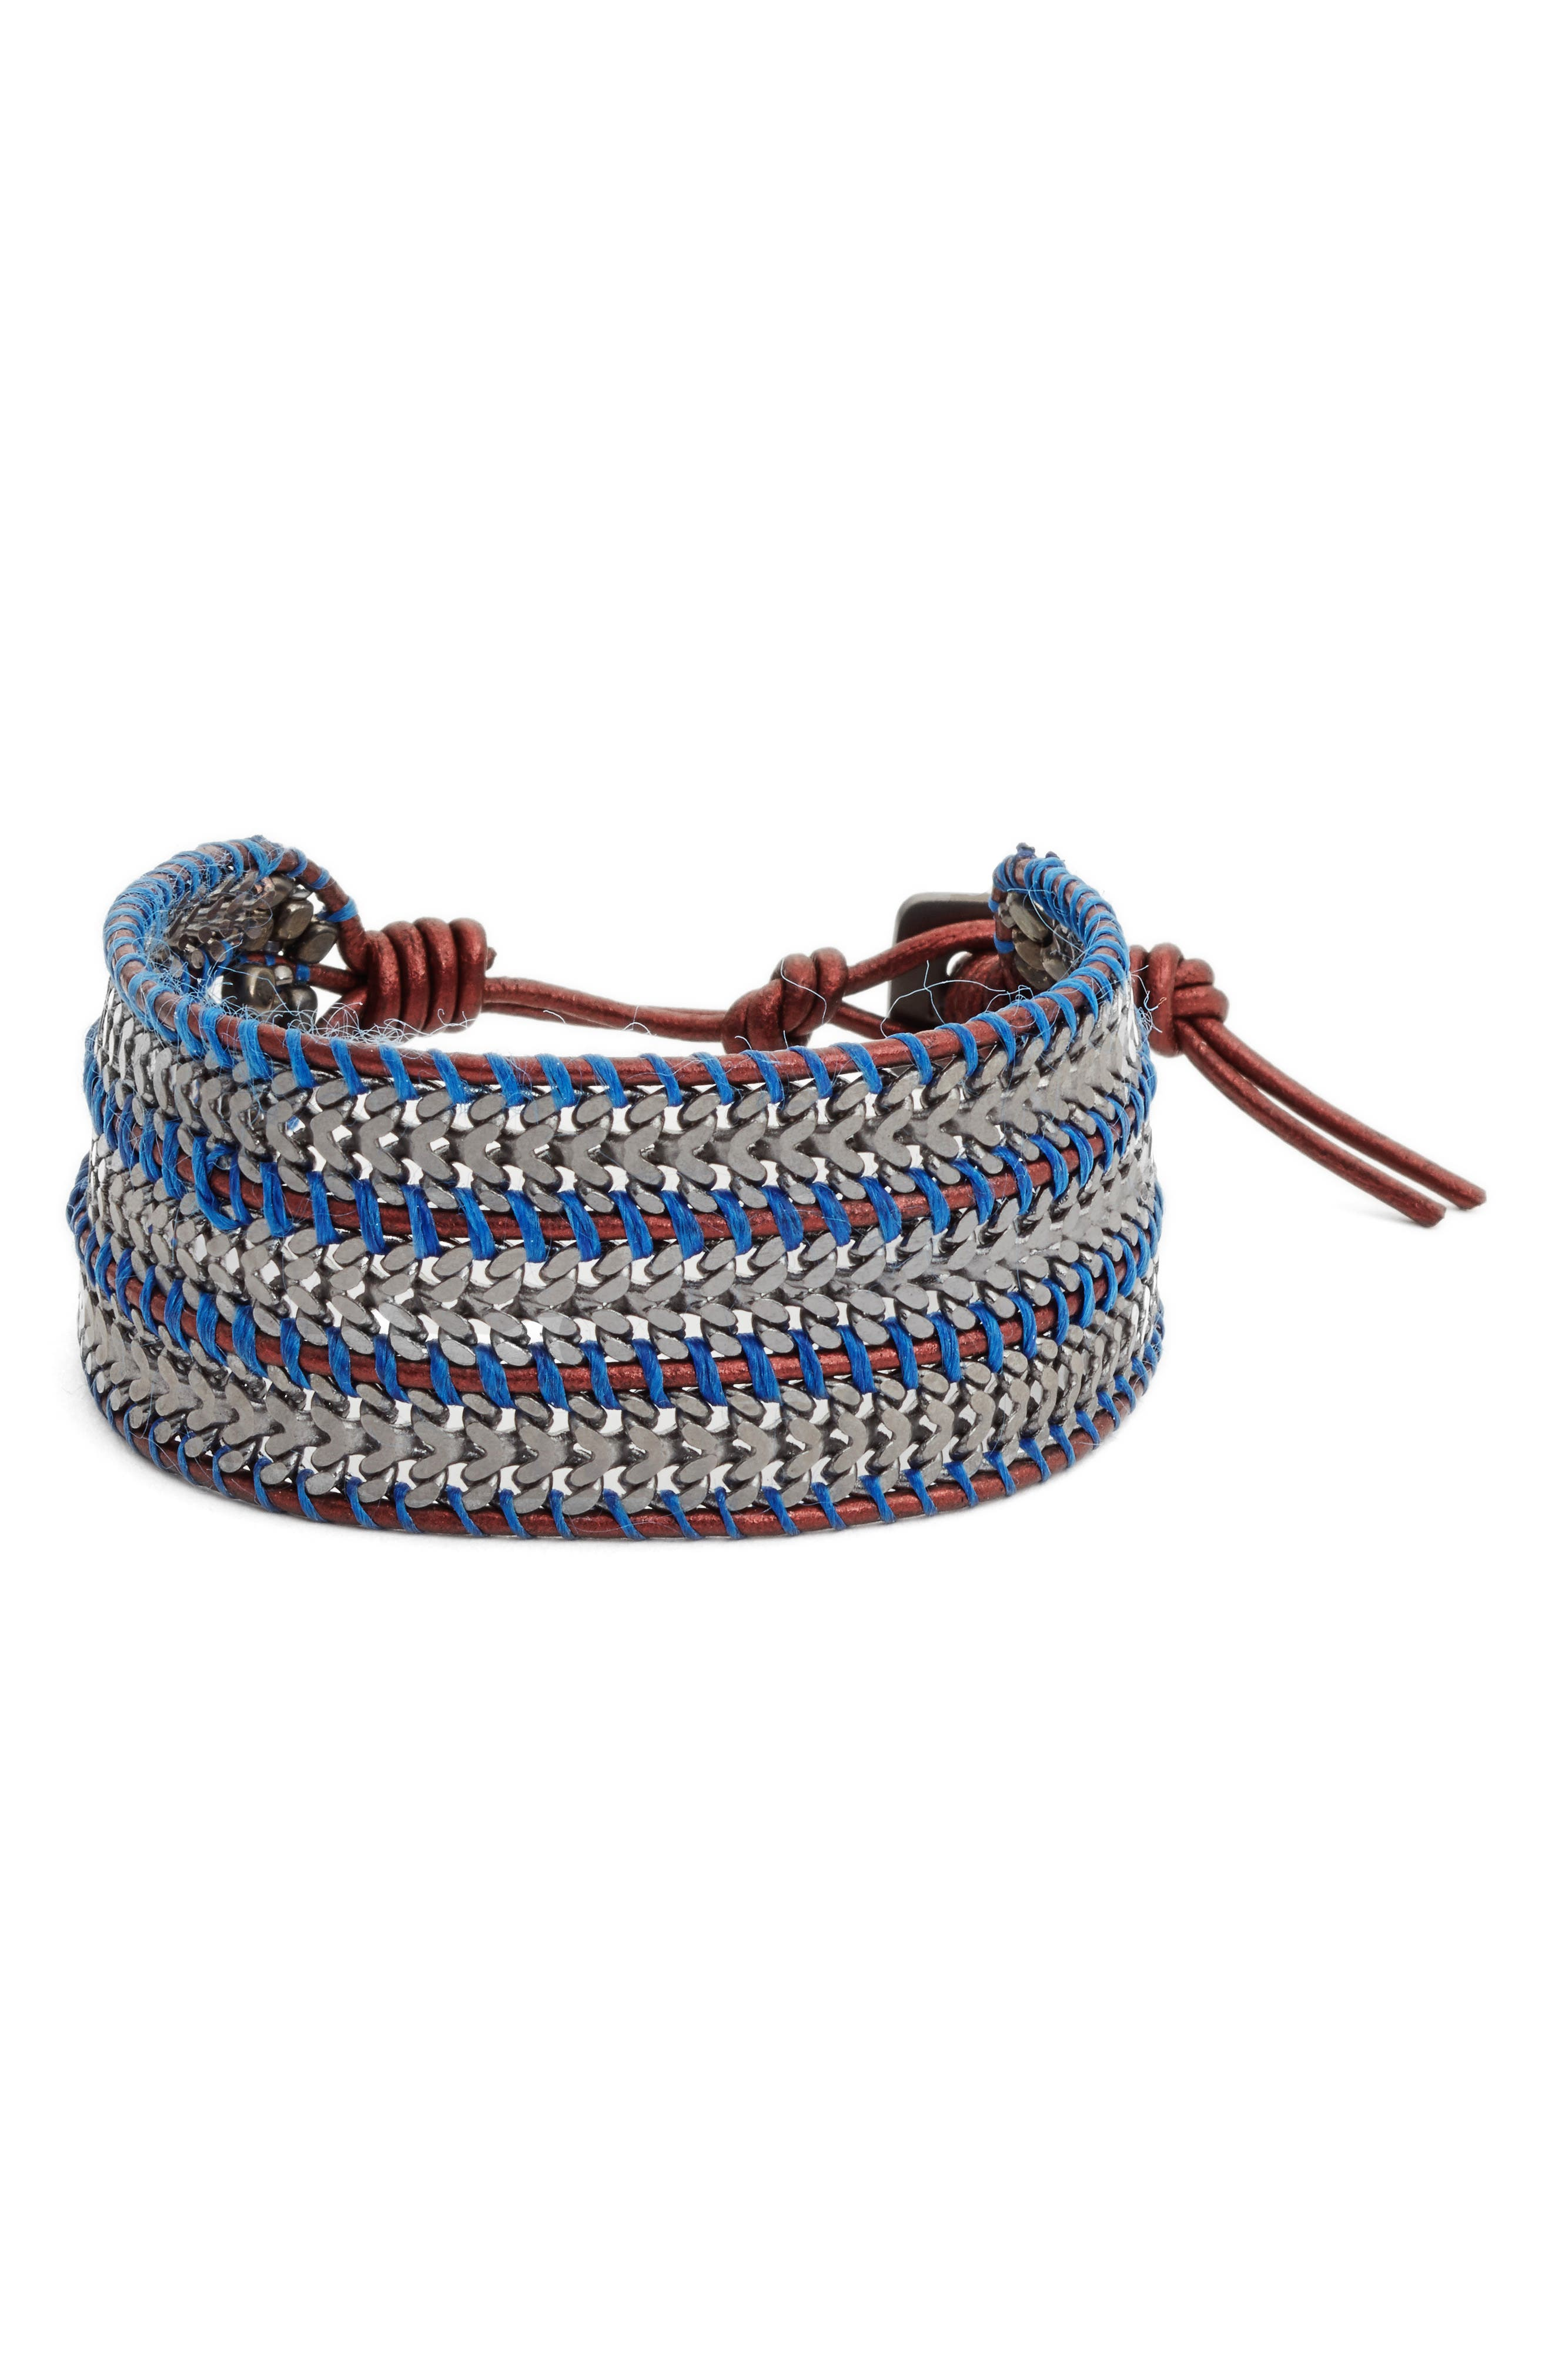 Trush Chain & Leather Bracelet,                             Main thumbnail 1, color,                             040